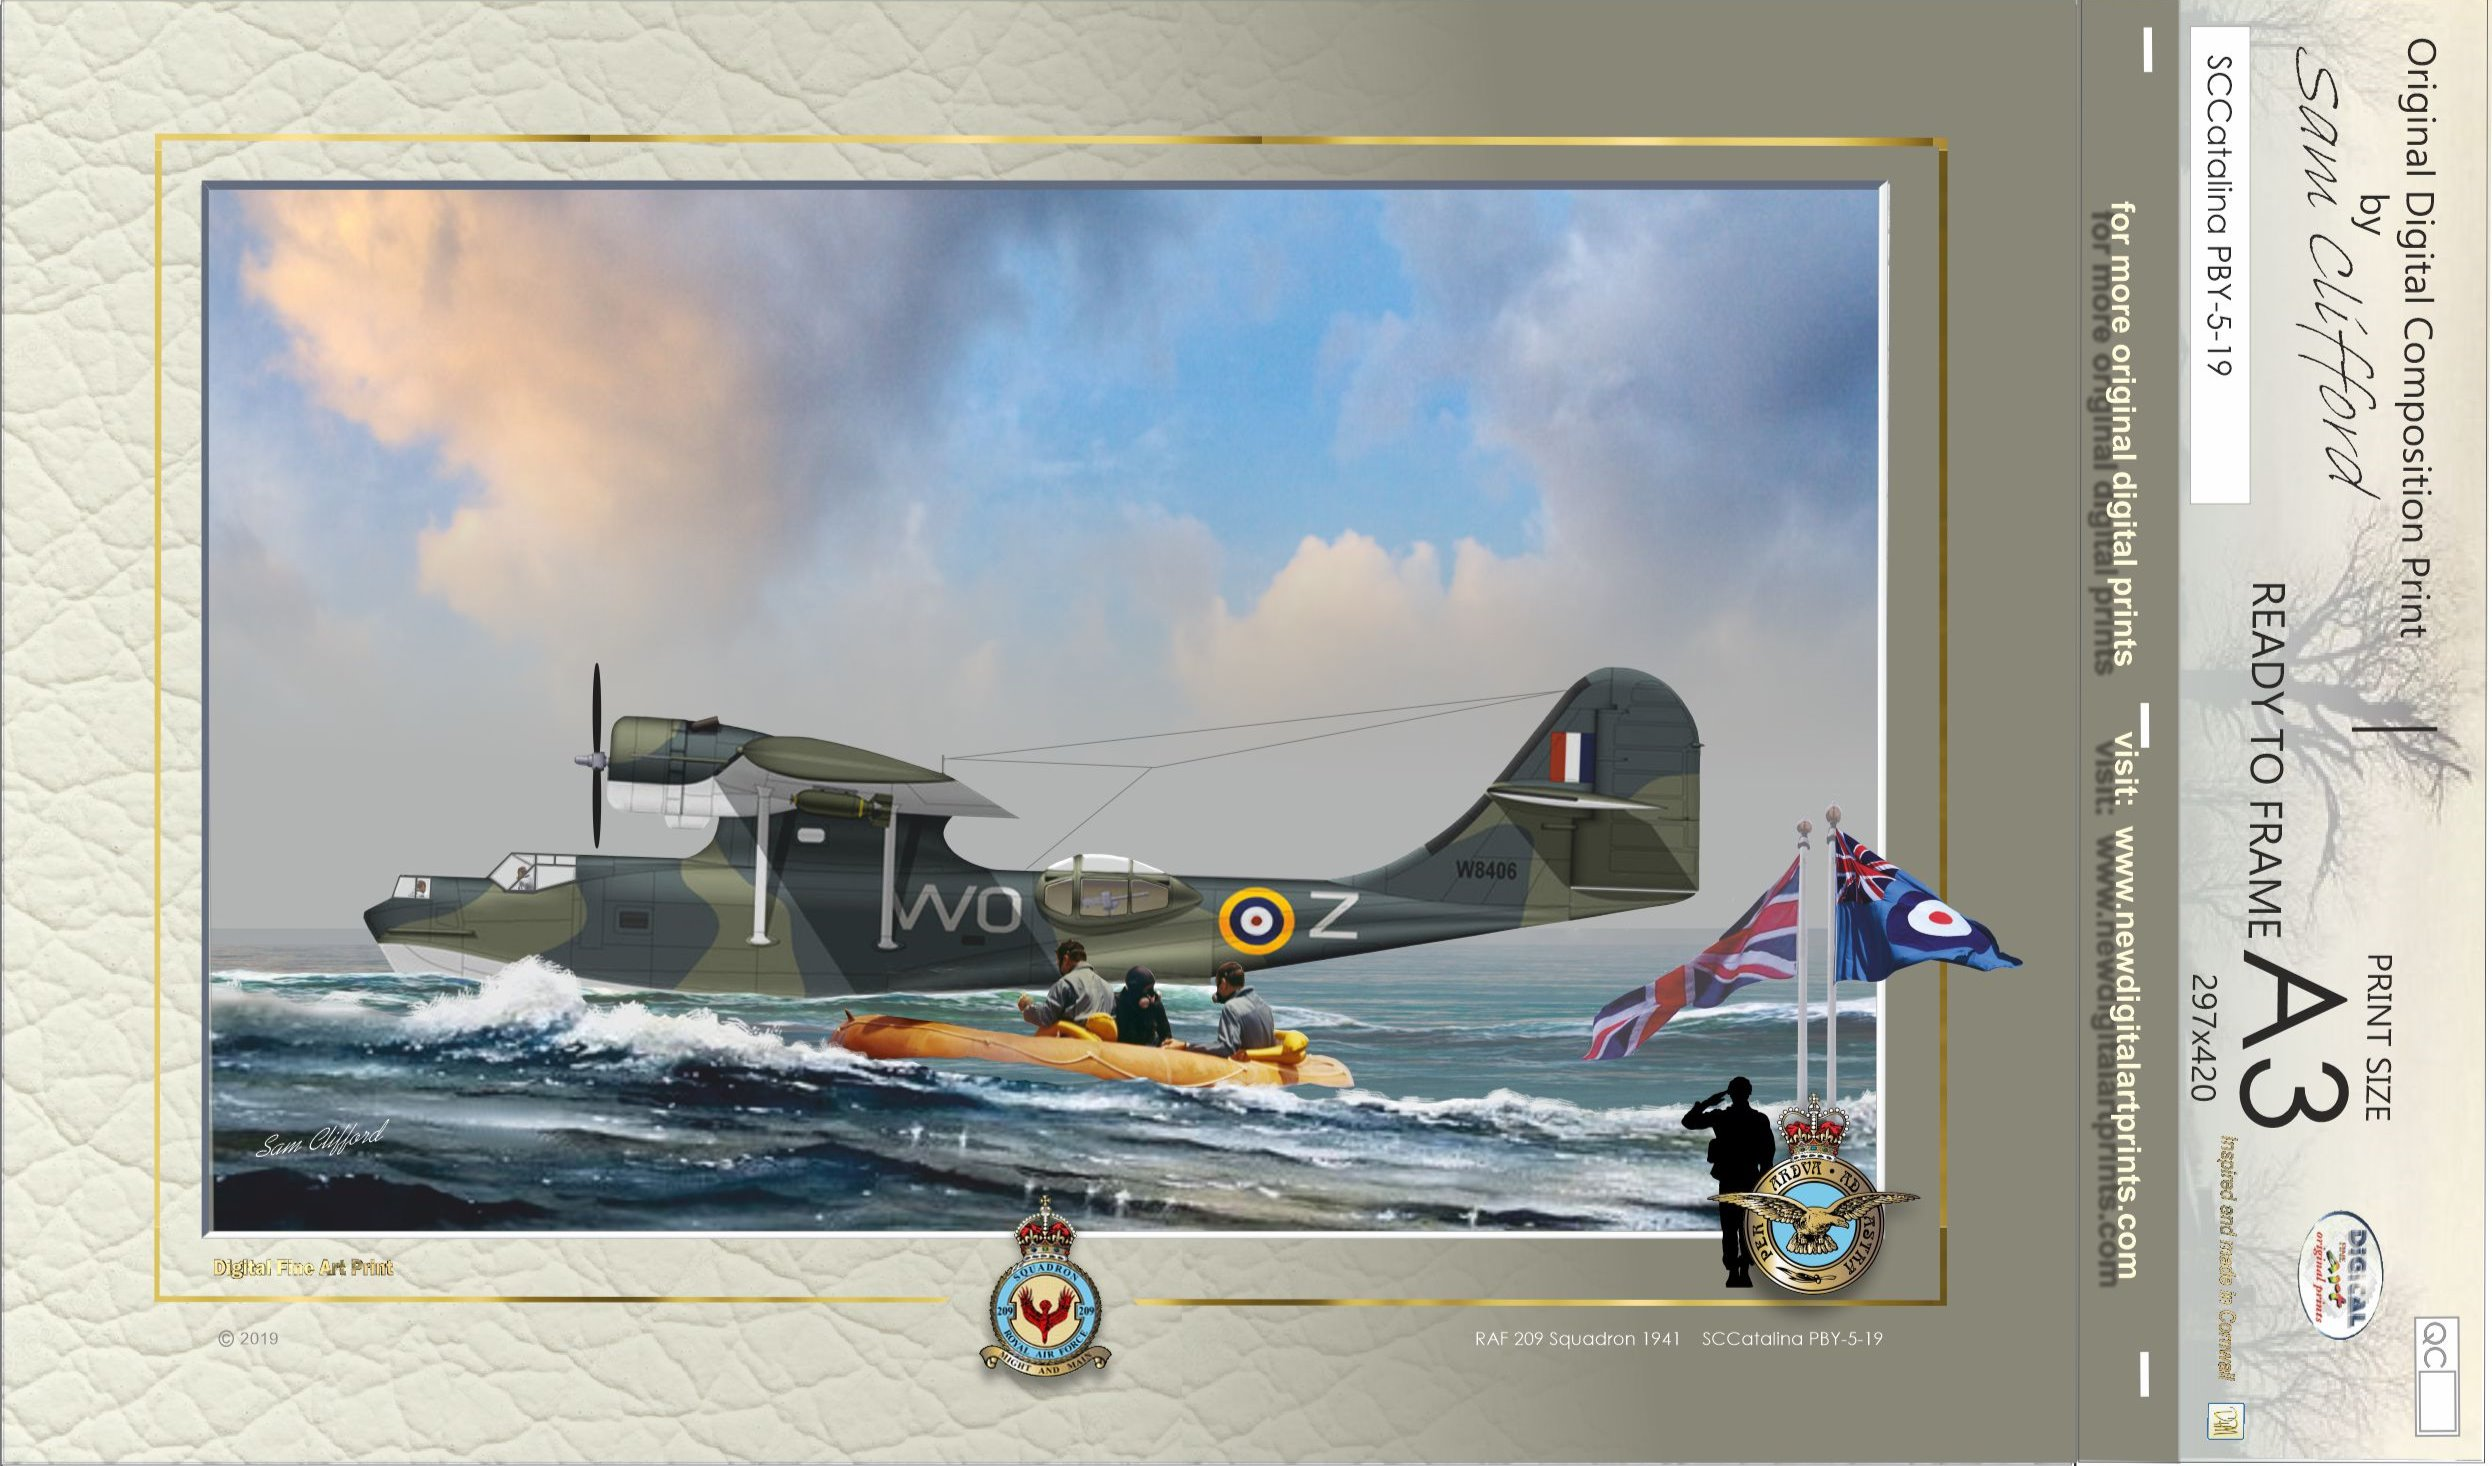 print code: SCCatalina PBY-5-19